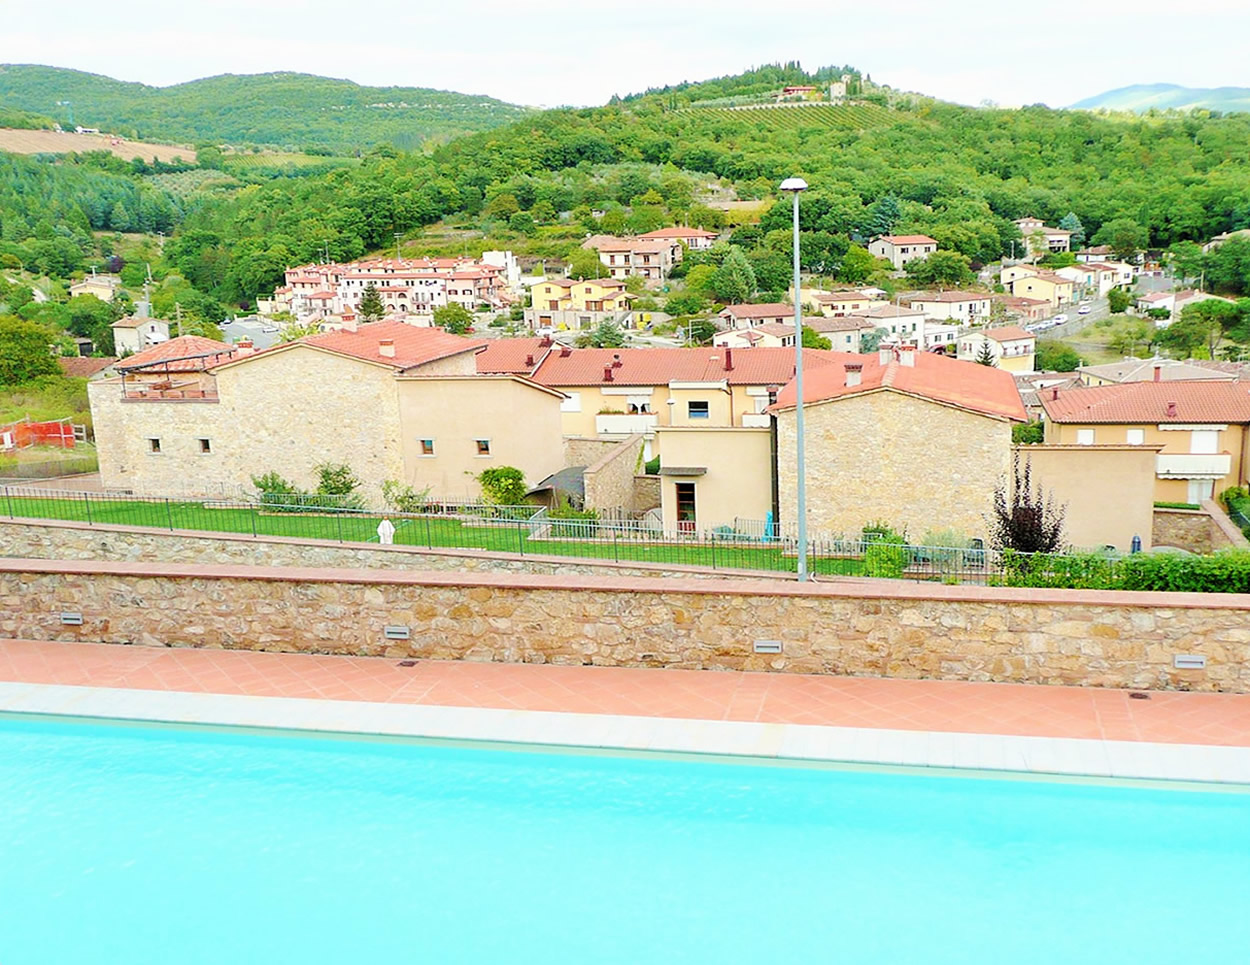 Casa Chianti 35, 2 BDR, Gaiole in Chianti, Siena, Tuscany